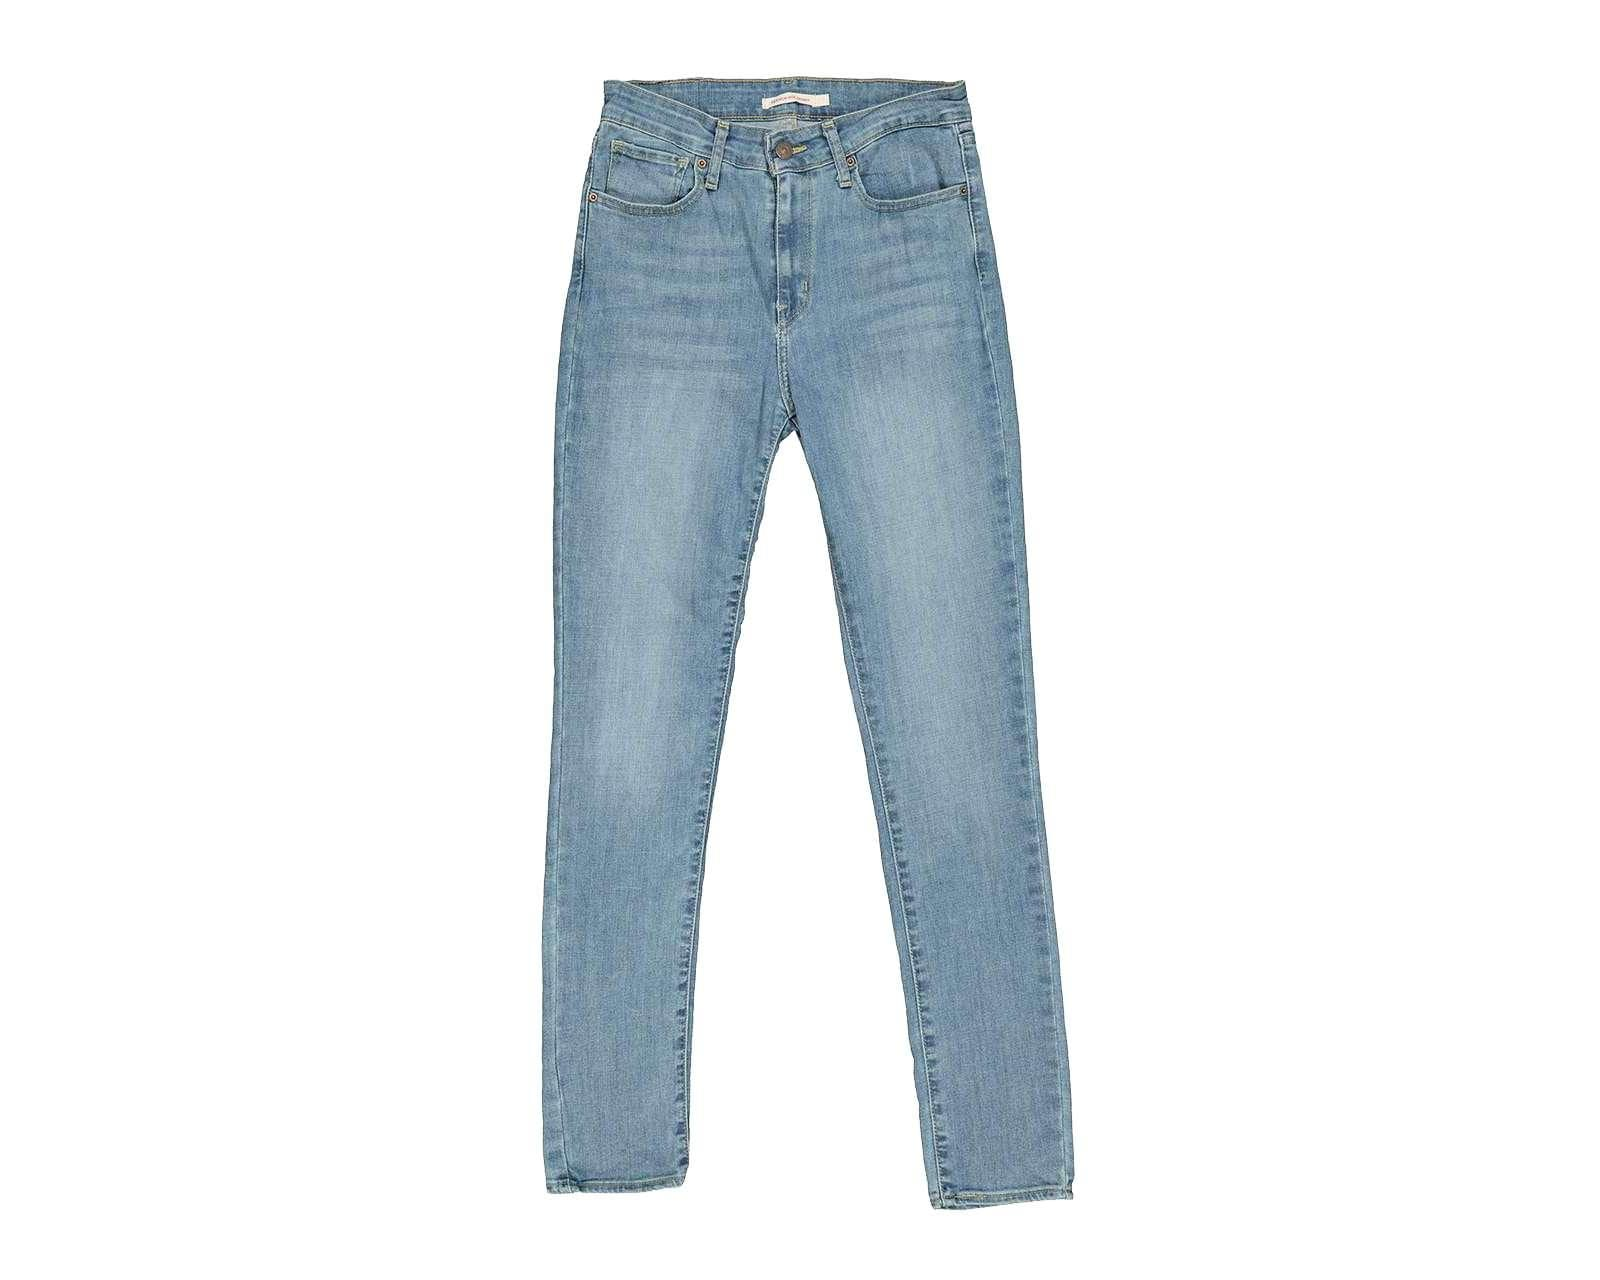 Foto 5 Jeans Levi's 721 Skinny